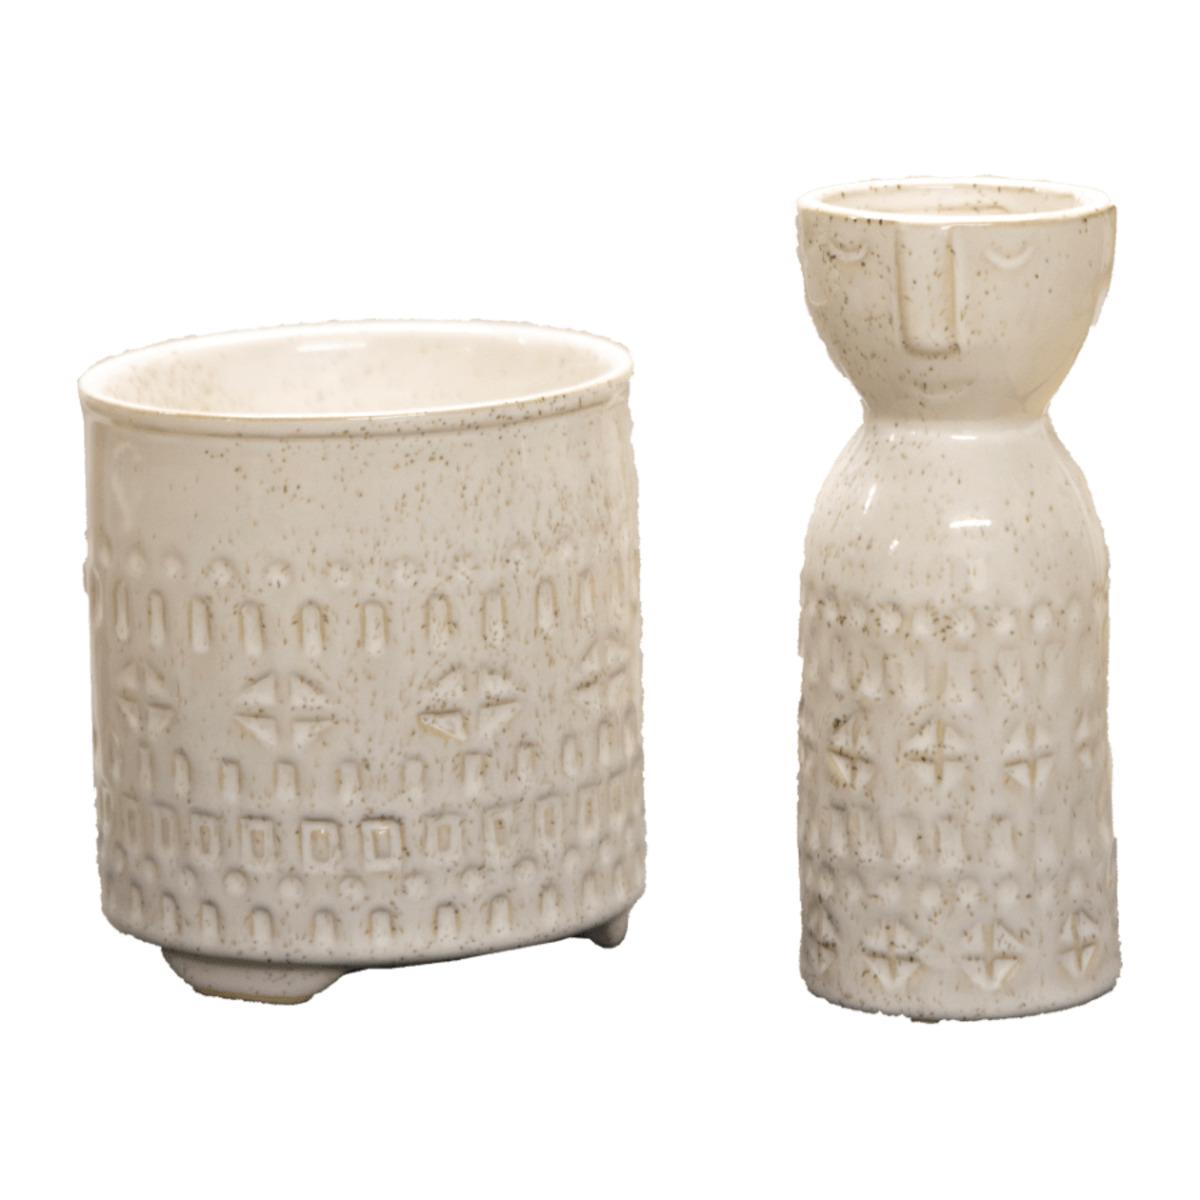 Bild 4 von LIVING ART     Keramik Sortiment